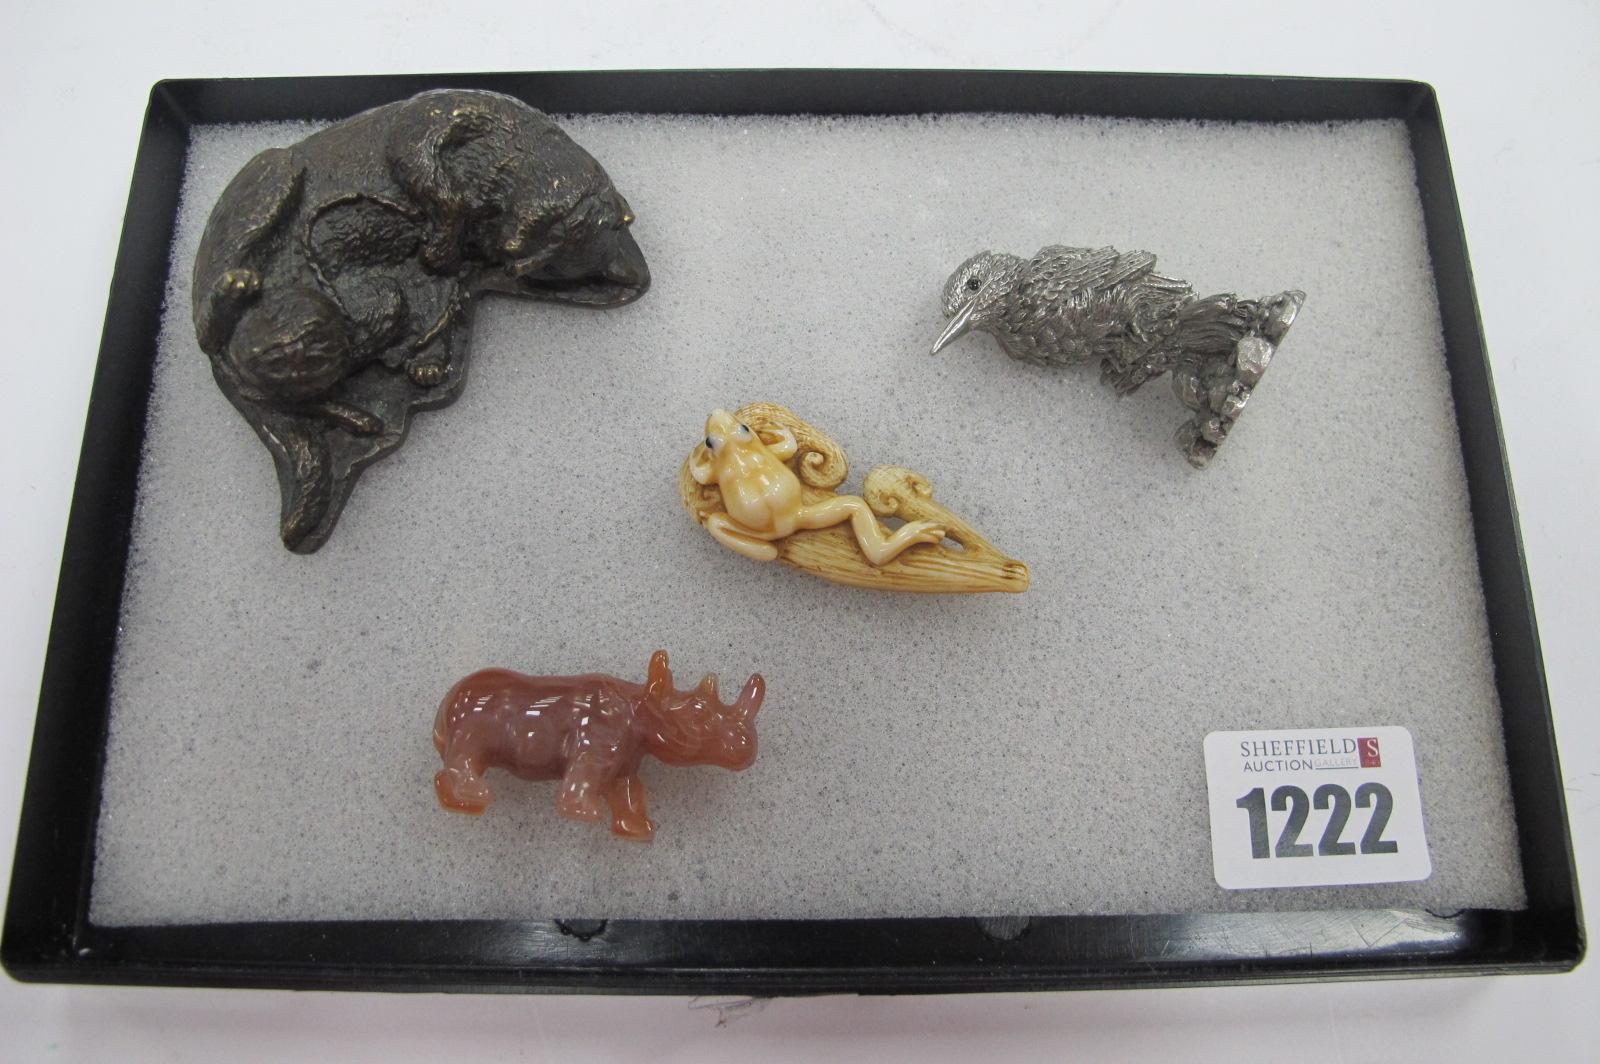 Oriental Carved Frog on Naturalistic Base, signed, 5.3cm long, mineral rhinoceros, Royal Selangor